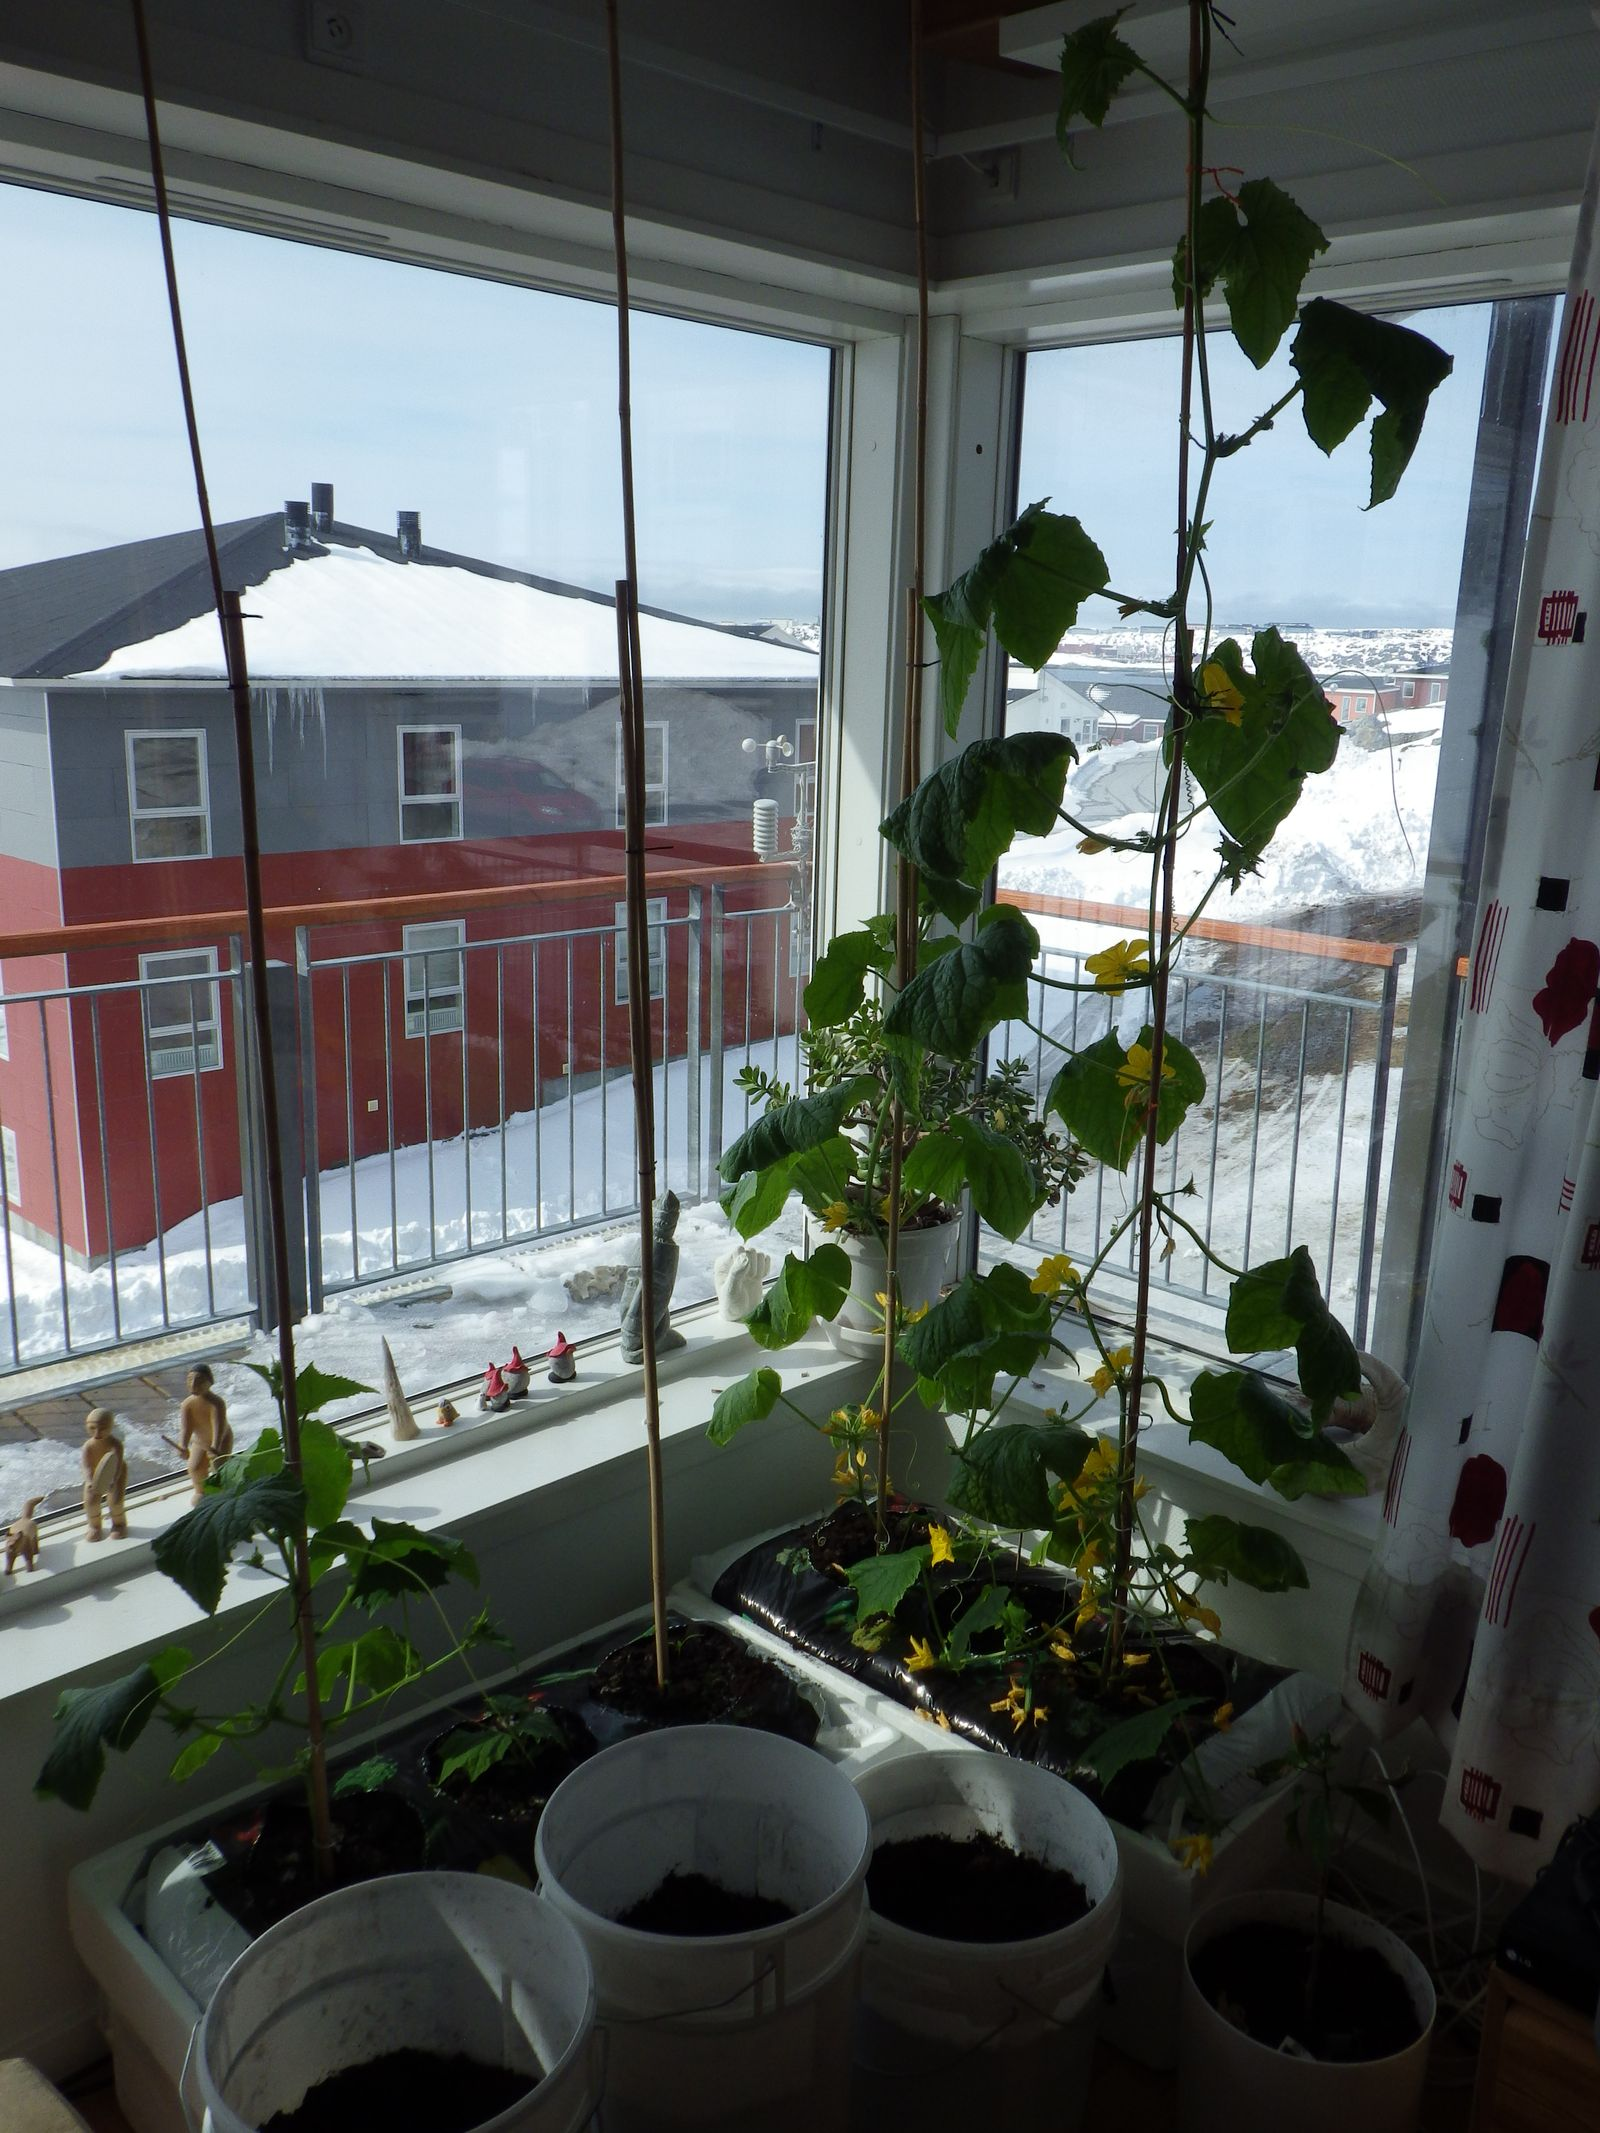 2014-04-26-1108_-_Agurkeplante_Kartofelspande_Planter